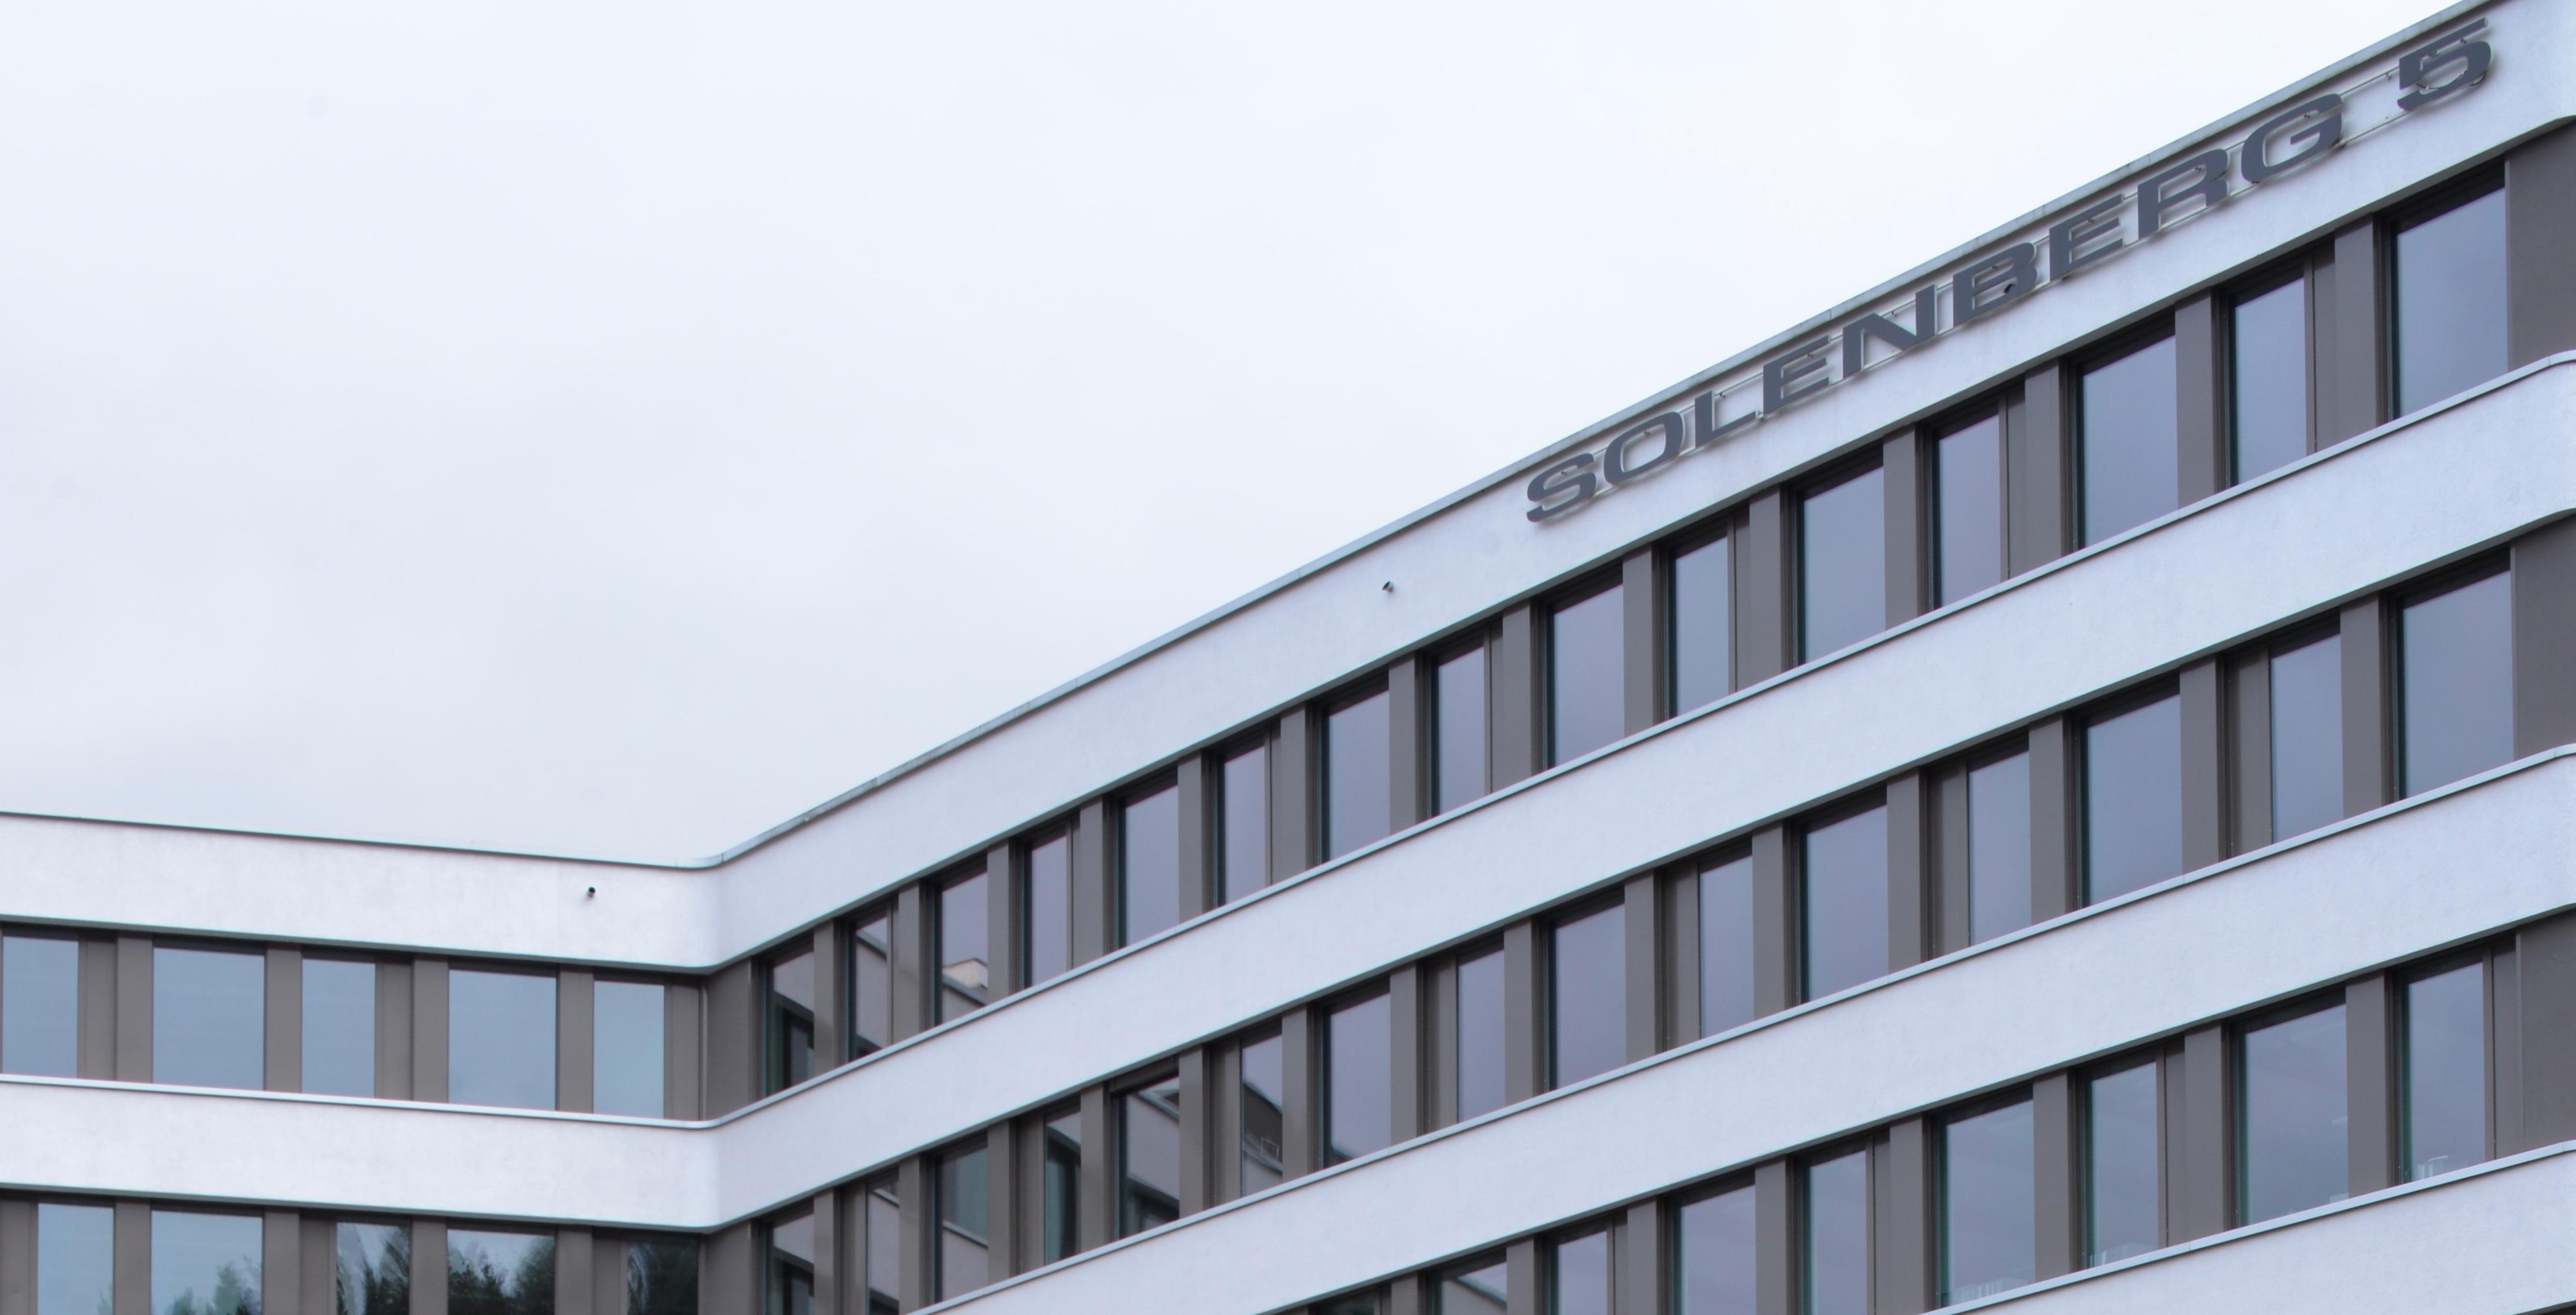 solenberg